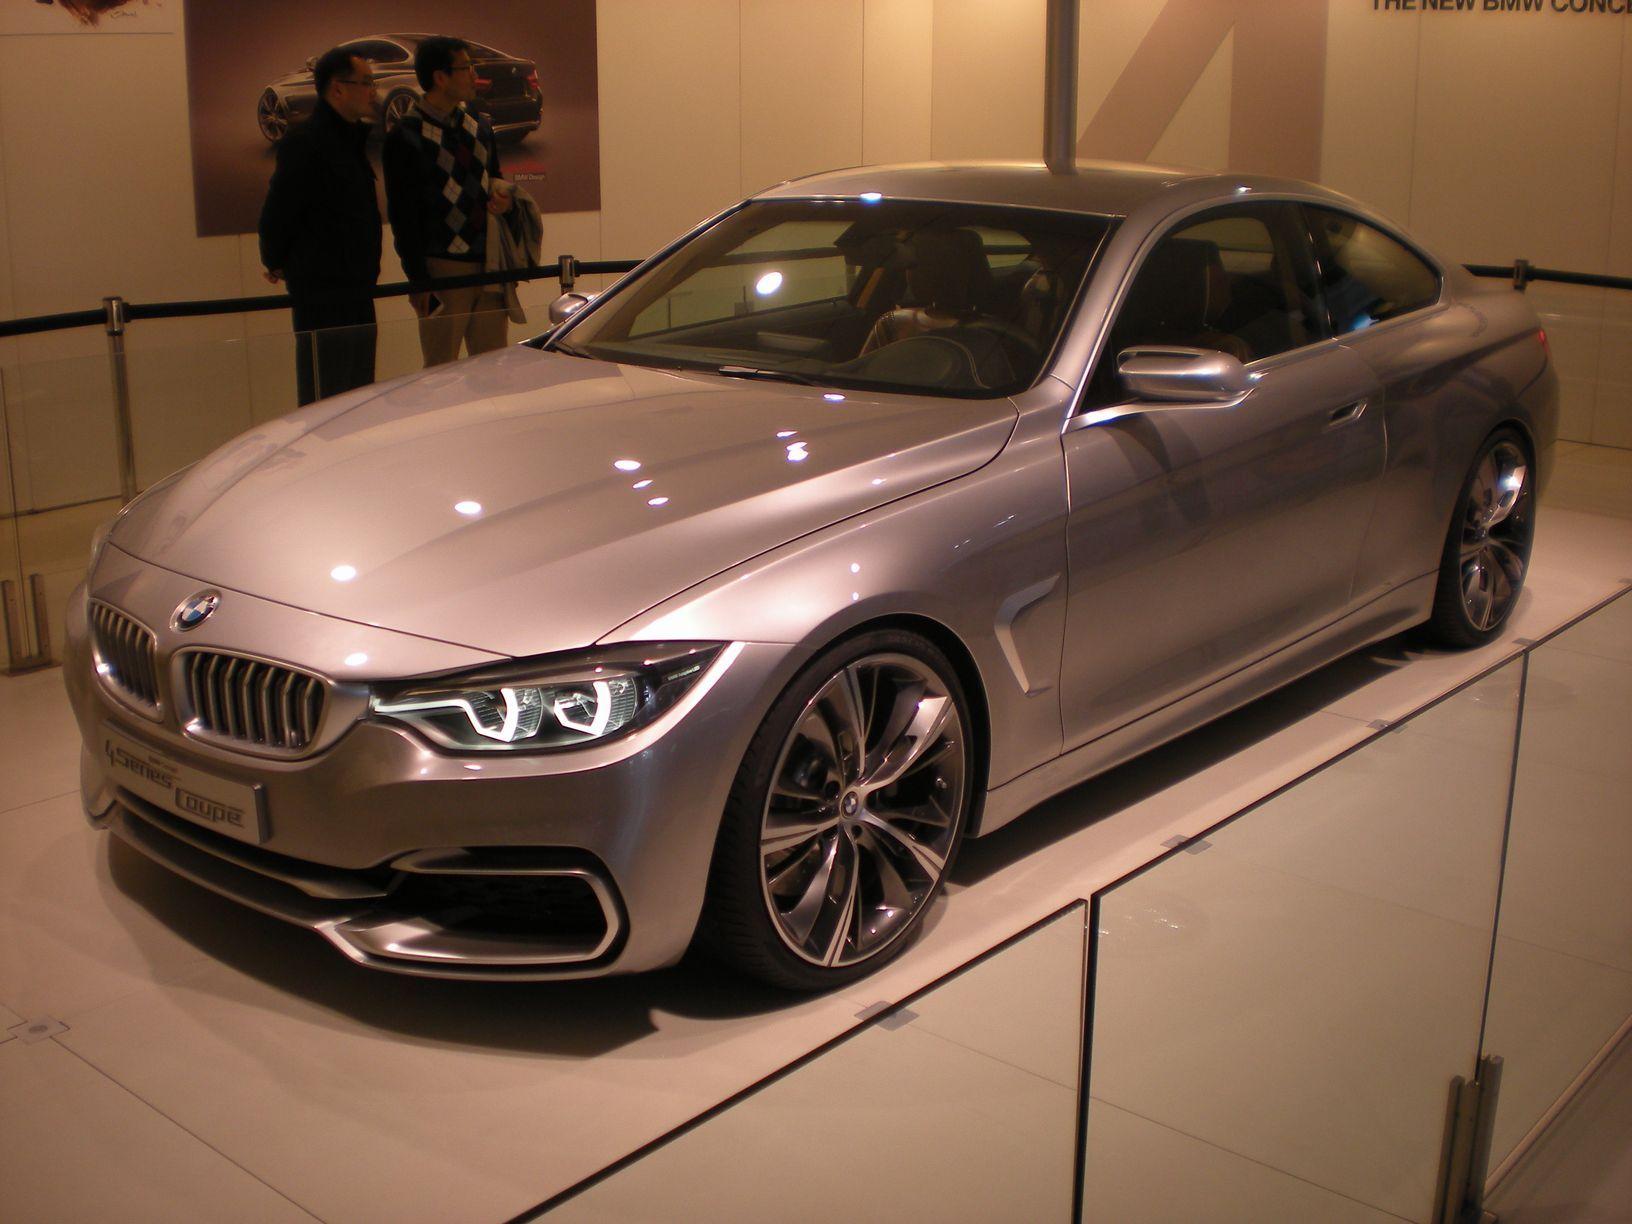 BMW X CAR Pinterest BMW And Cars - Bmw 4 series models